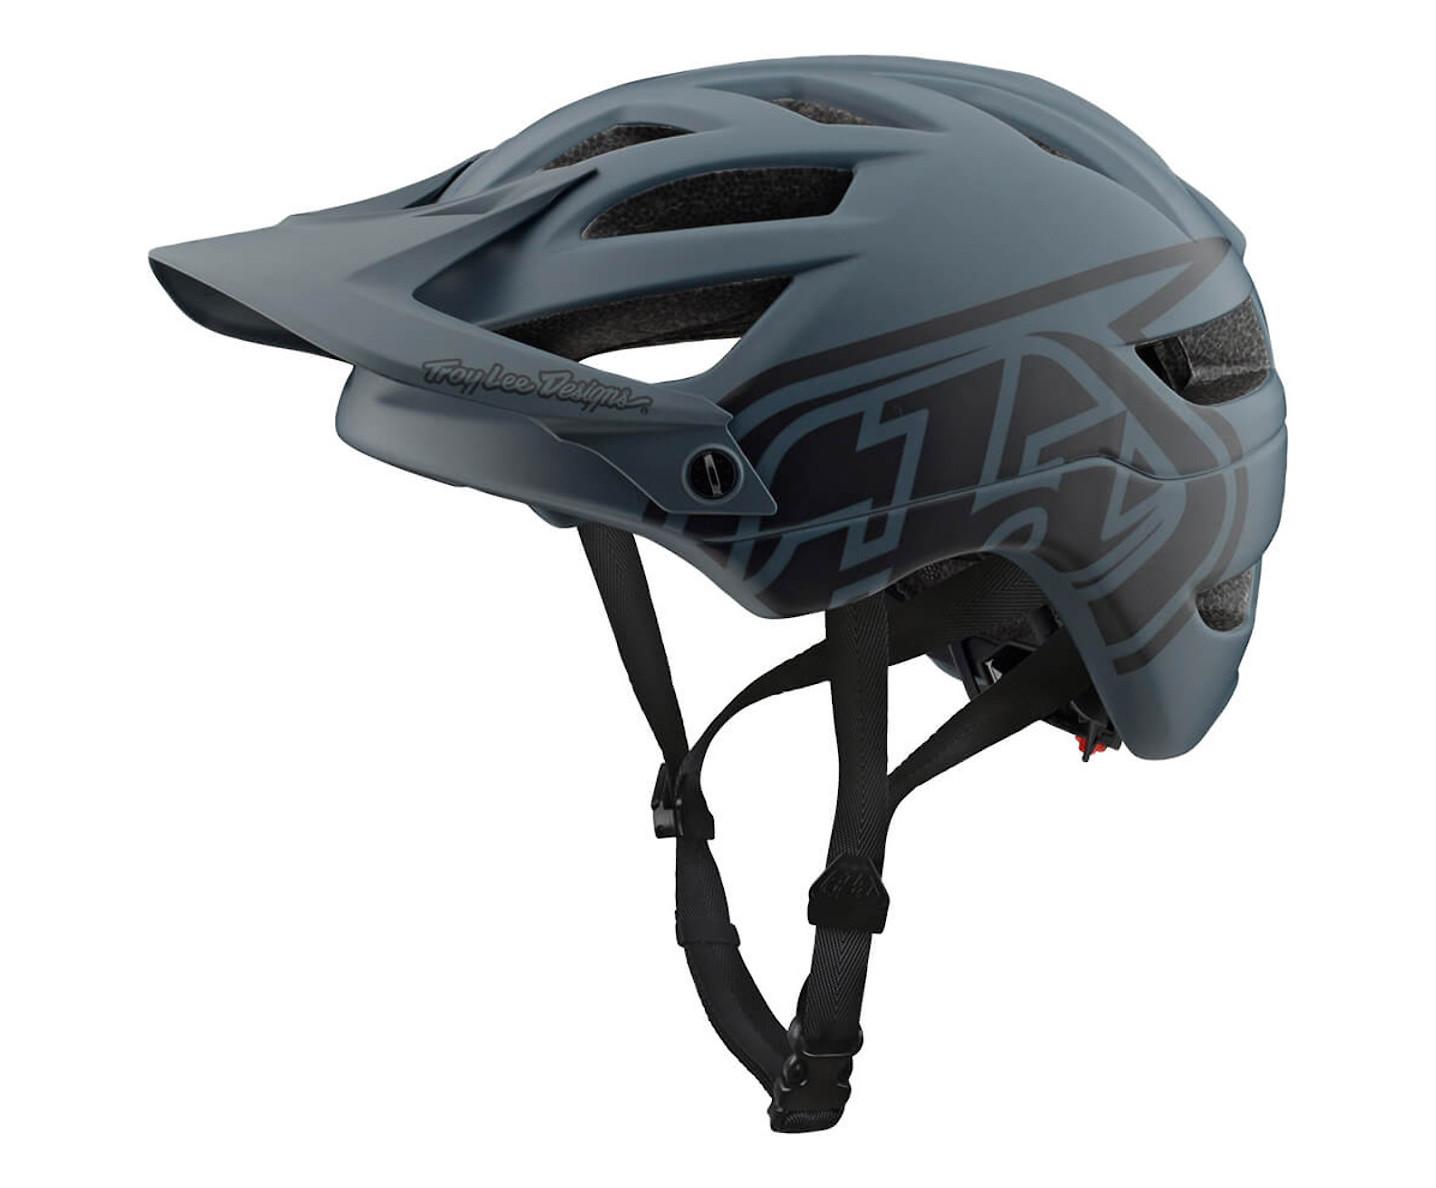 2019 A1 Drone Helmet (grey/black)